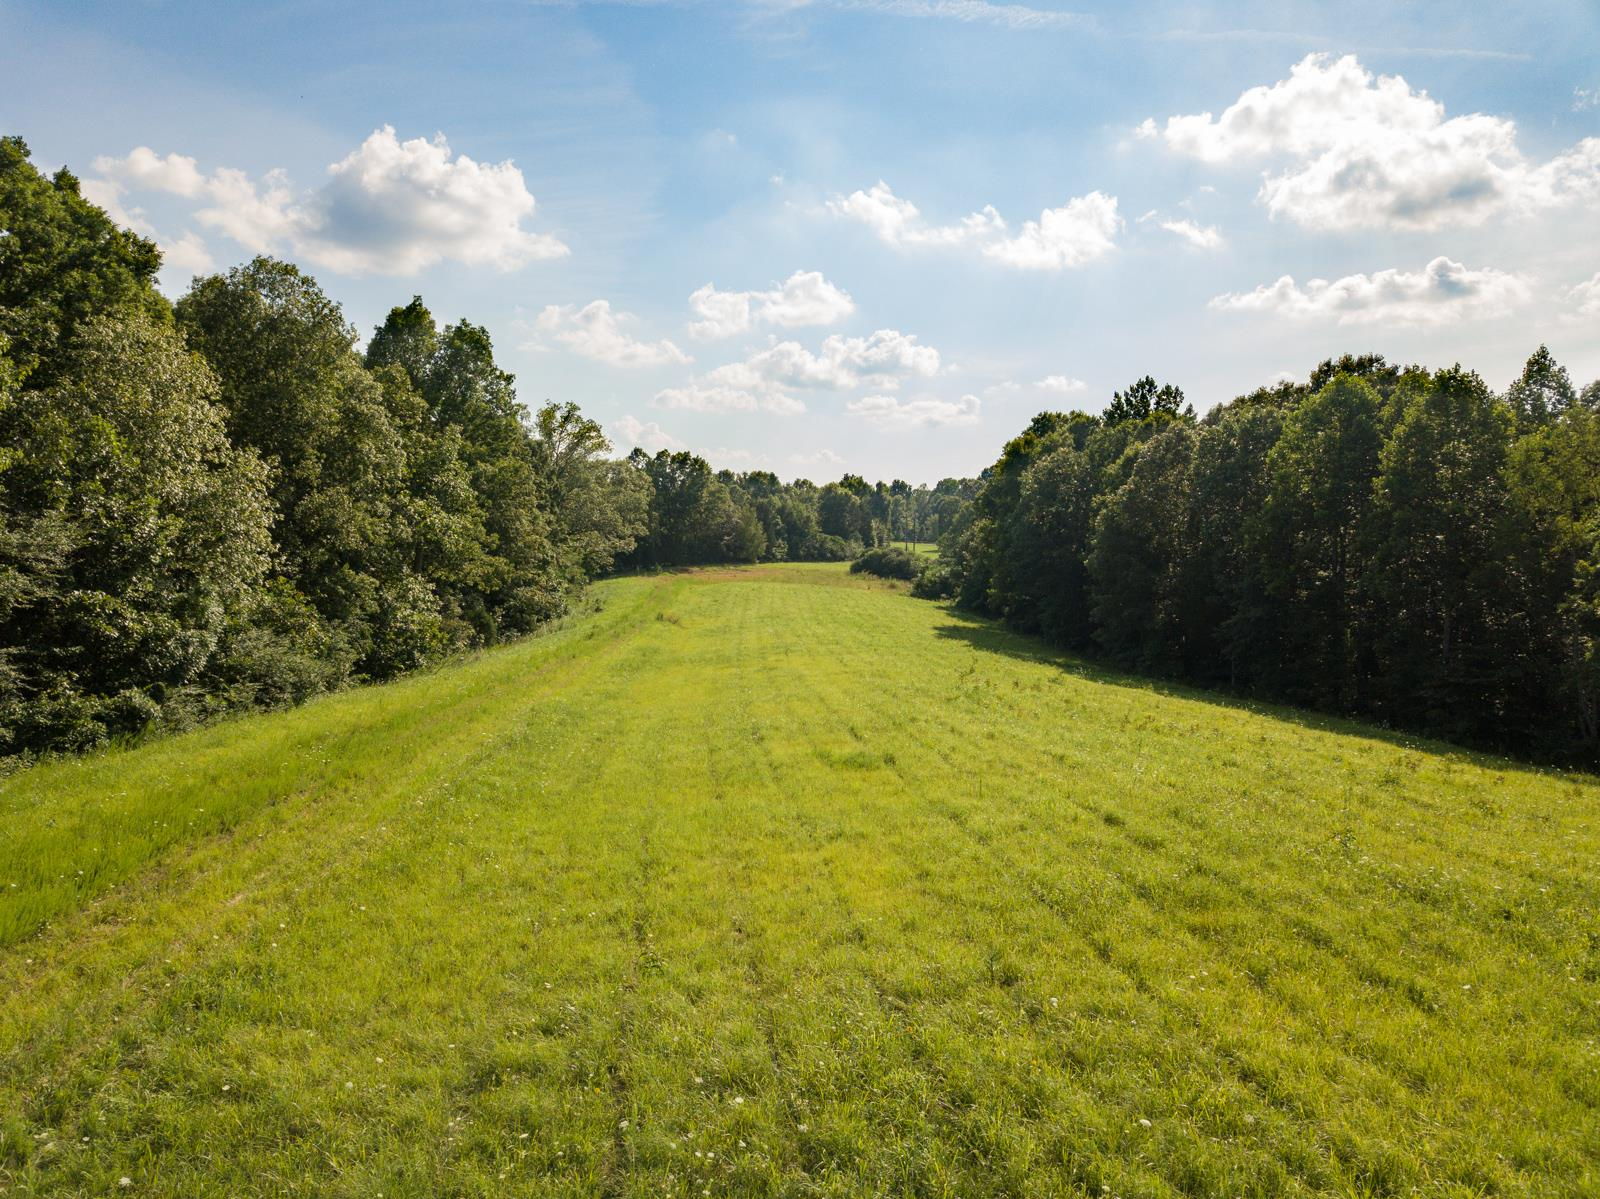 7913 Daugherty Capley Rd, Primm Springs, TN 38476 - Primm Springs, TN real estate listing